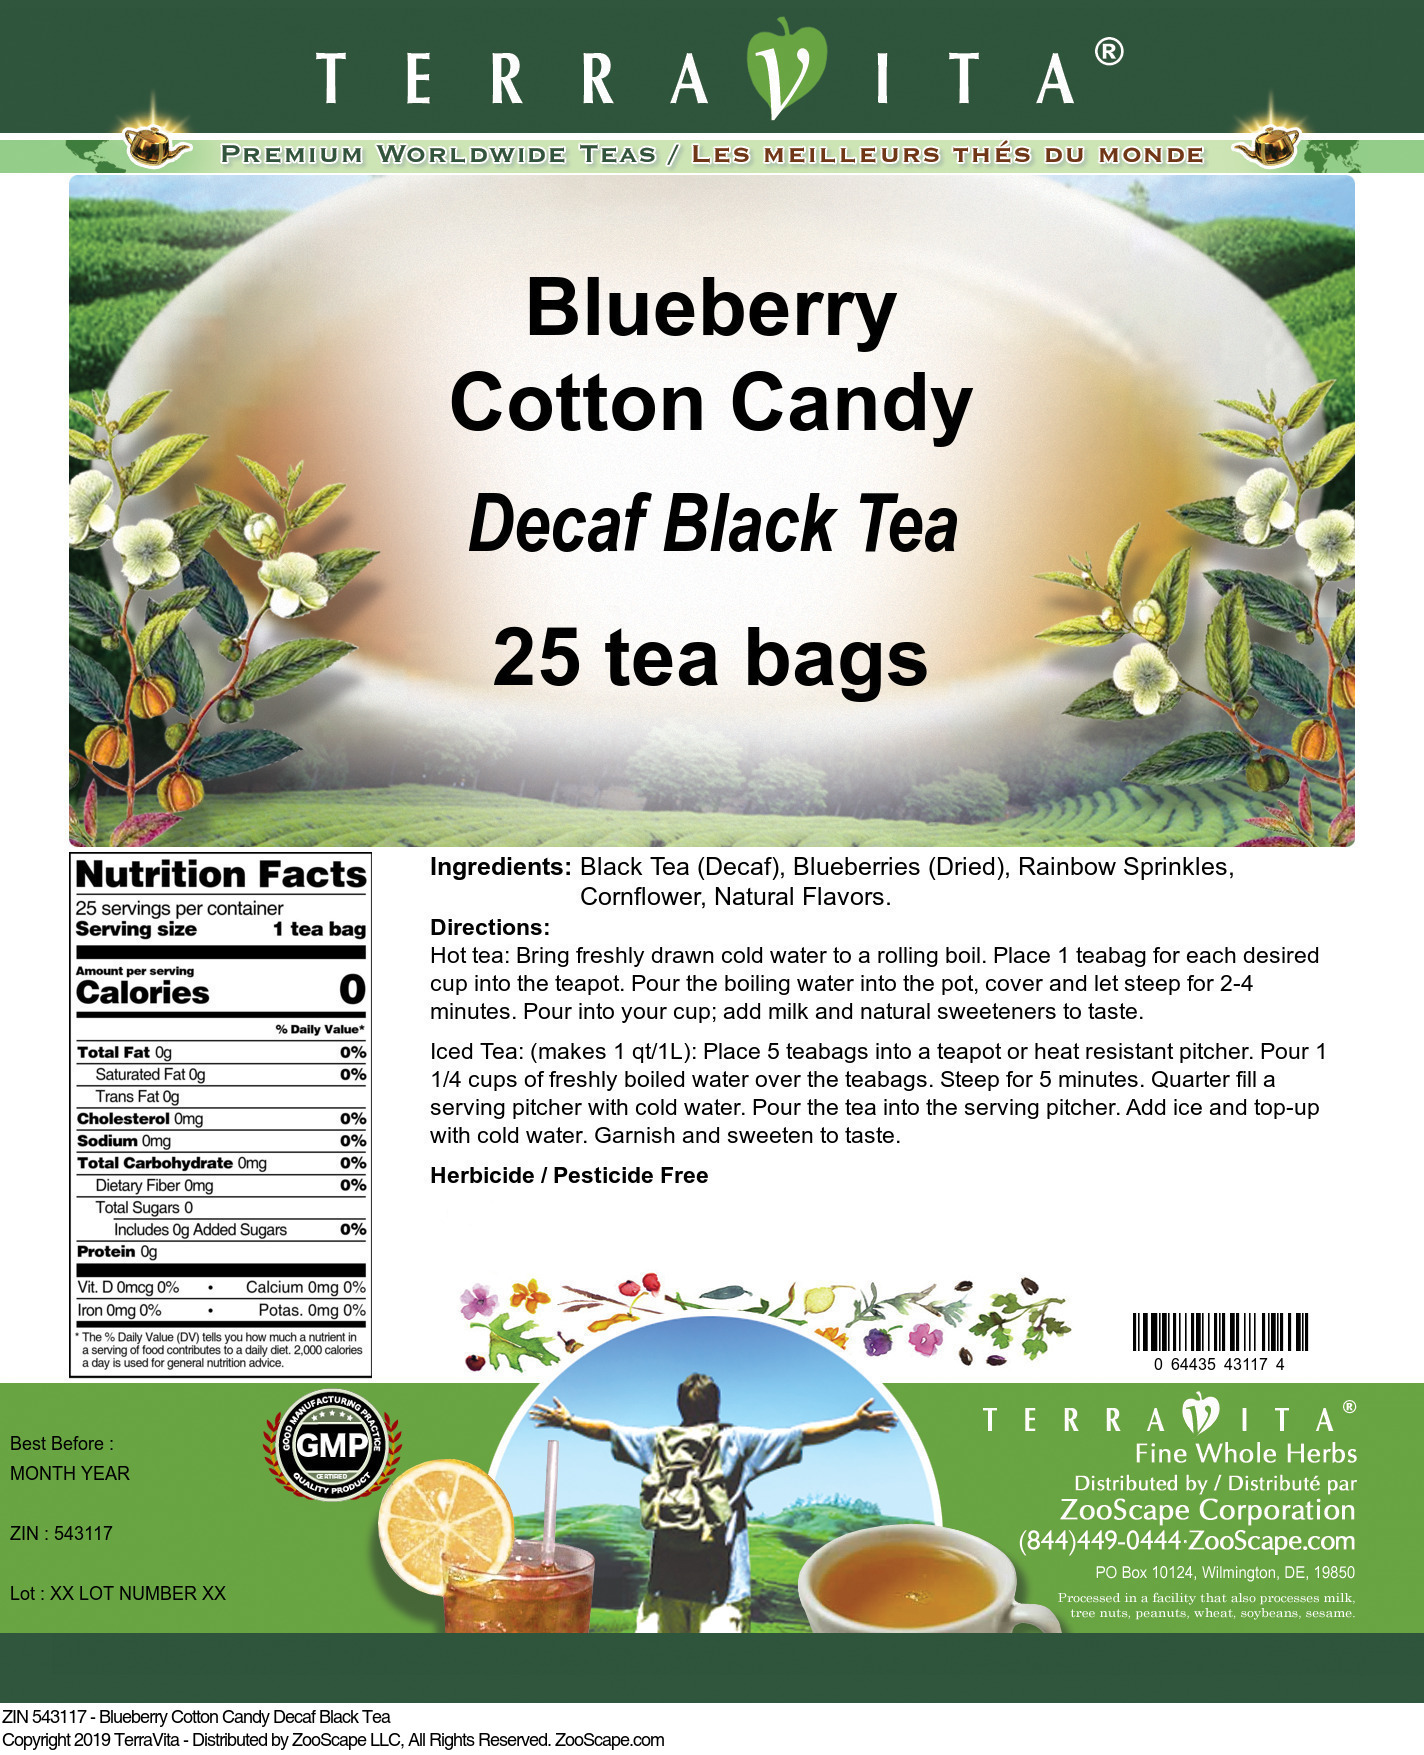 Blueberry Cotton Candy Decaf Black Tea